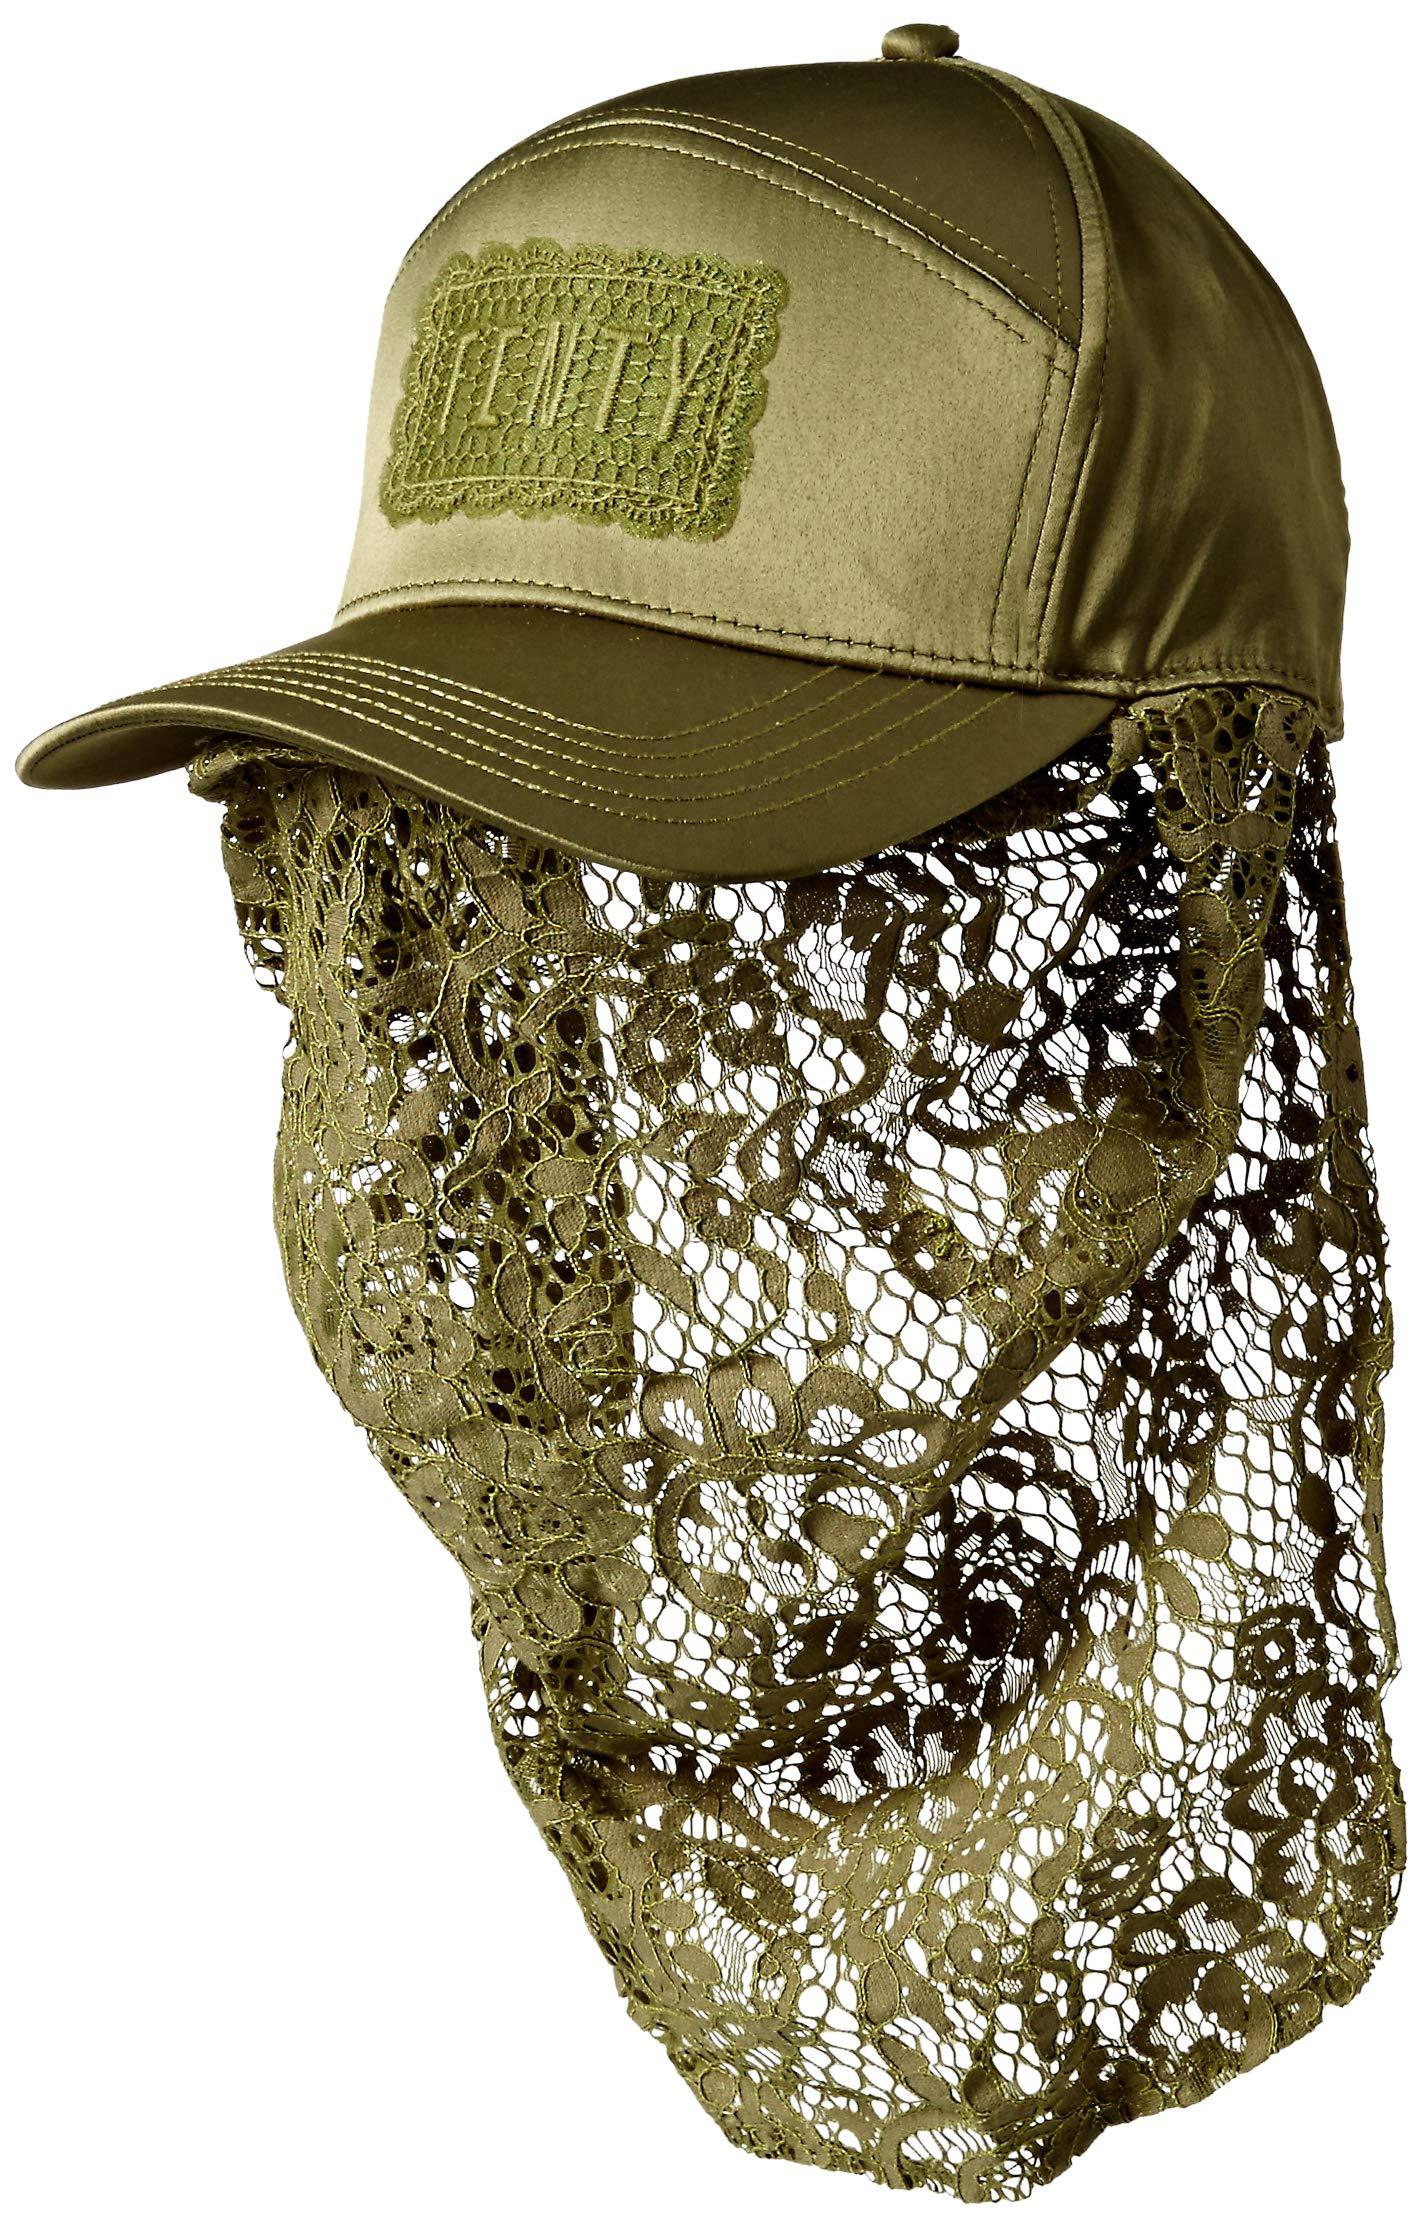 PUMA Women's Fenty Masked Cap LACE, Olive Branch Adult